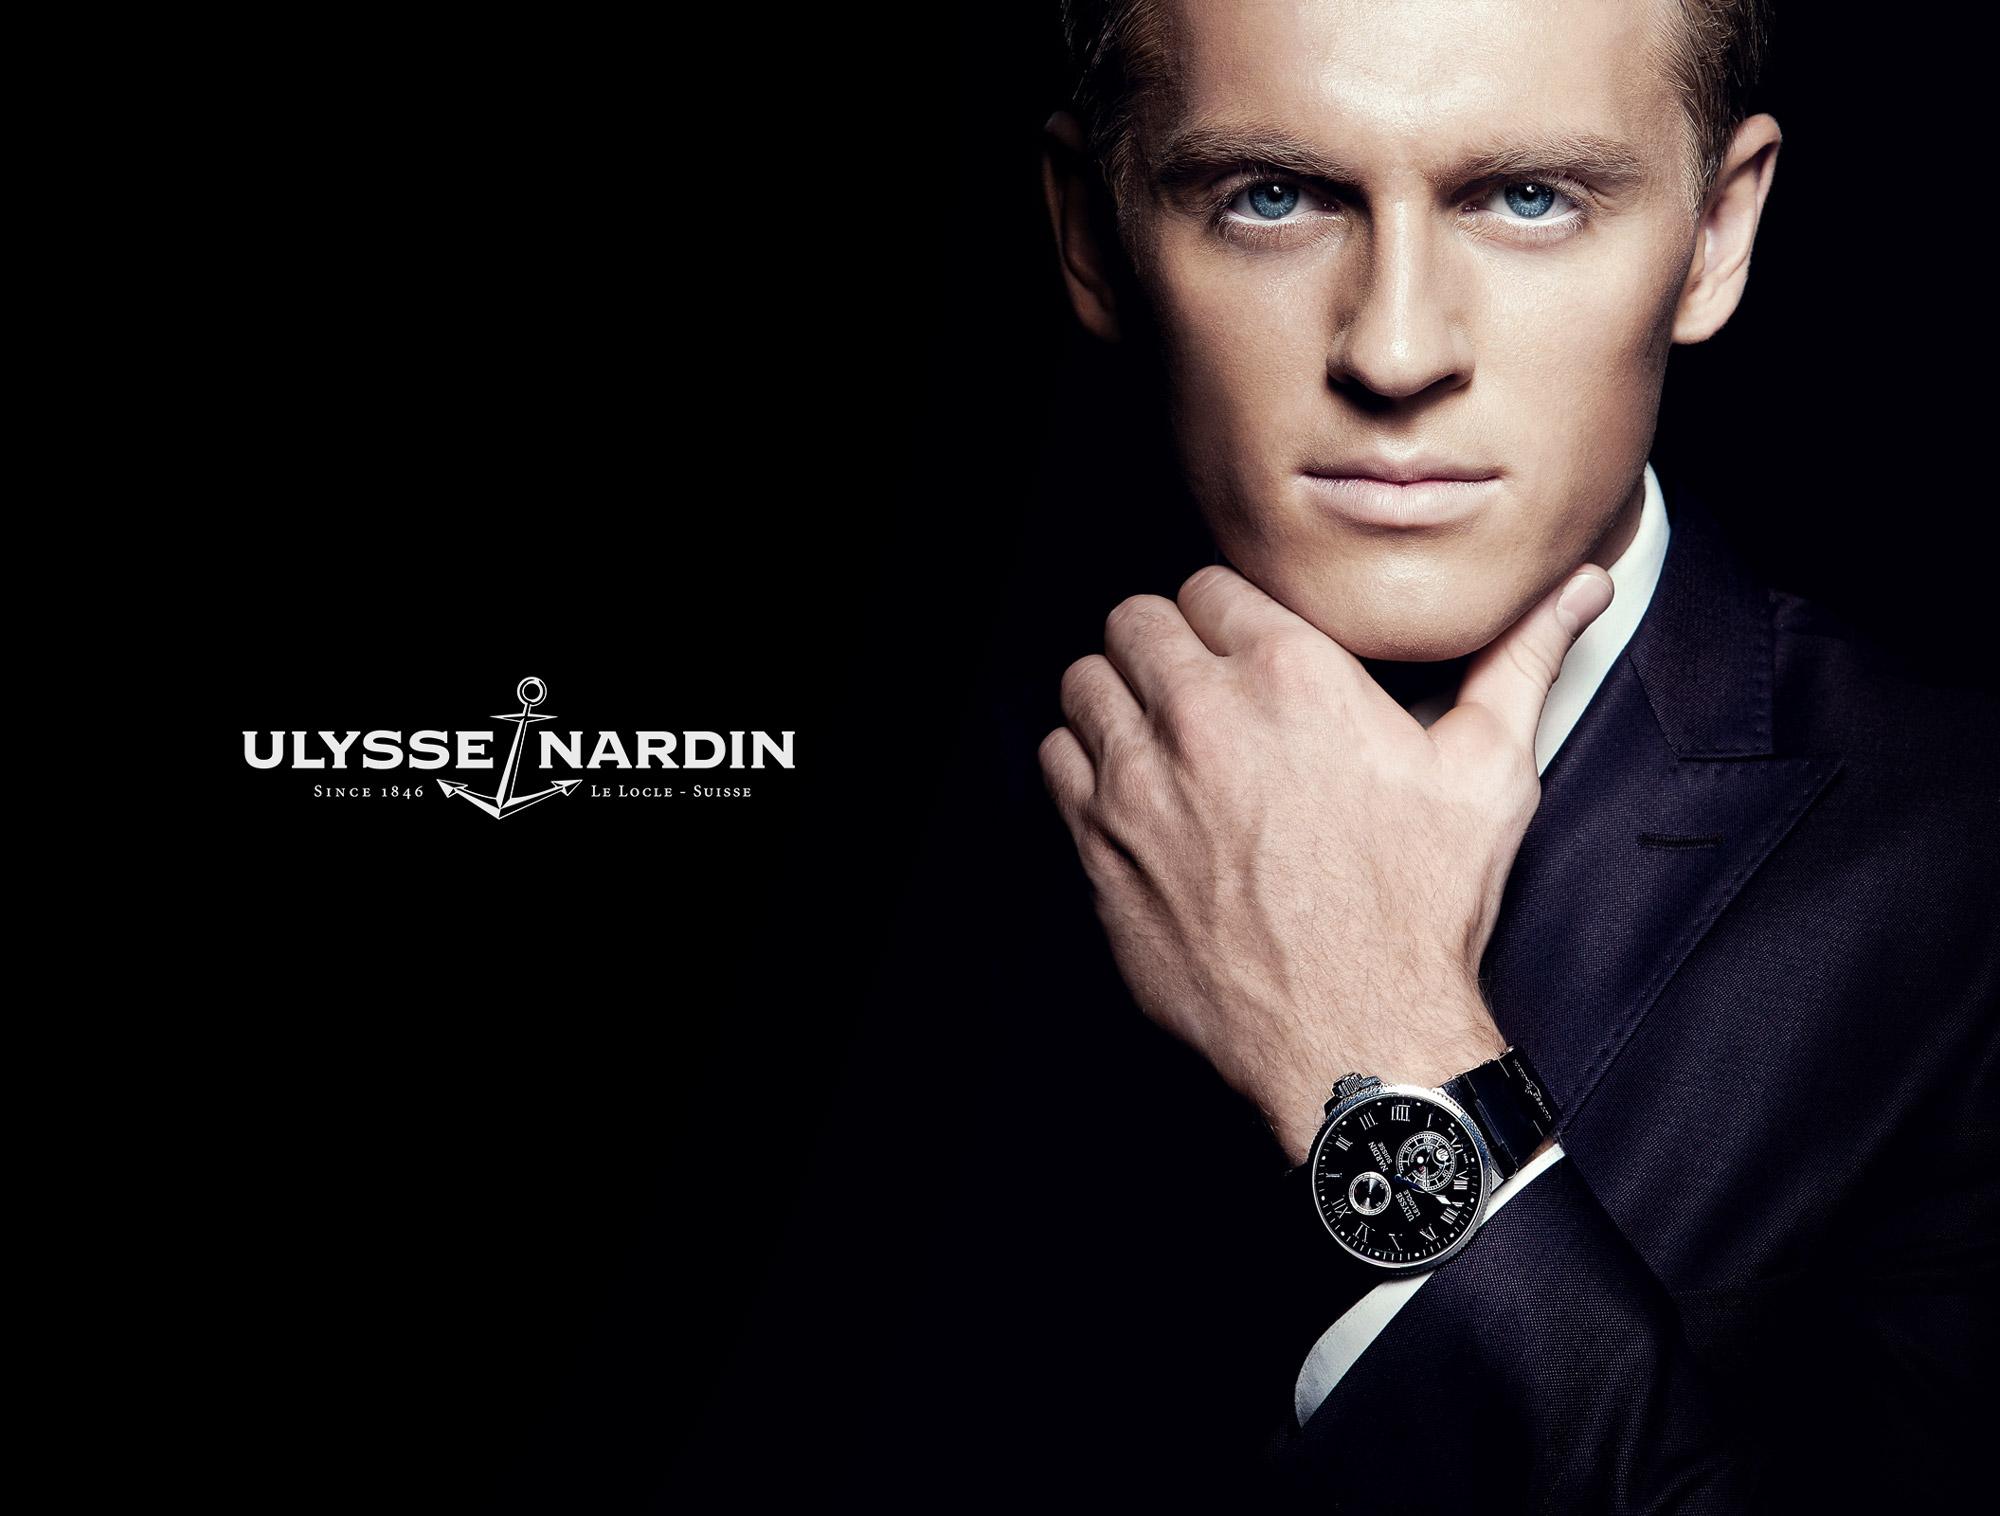 Portfolio - Ulysse Nardin | Alexander Sakulin - Professional Photographer